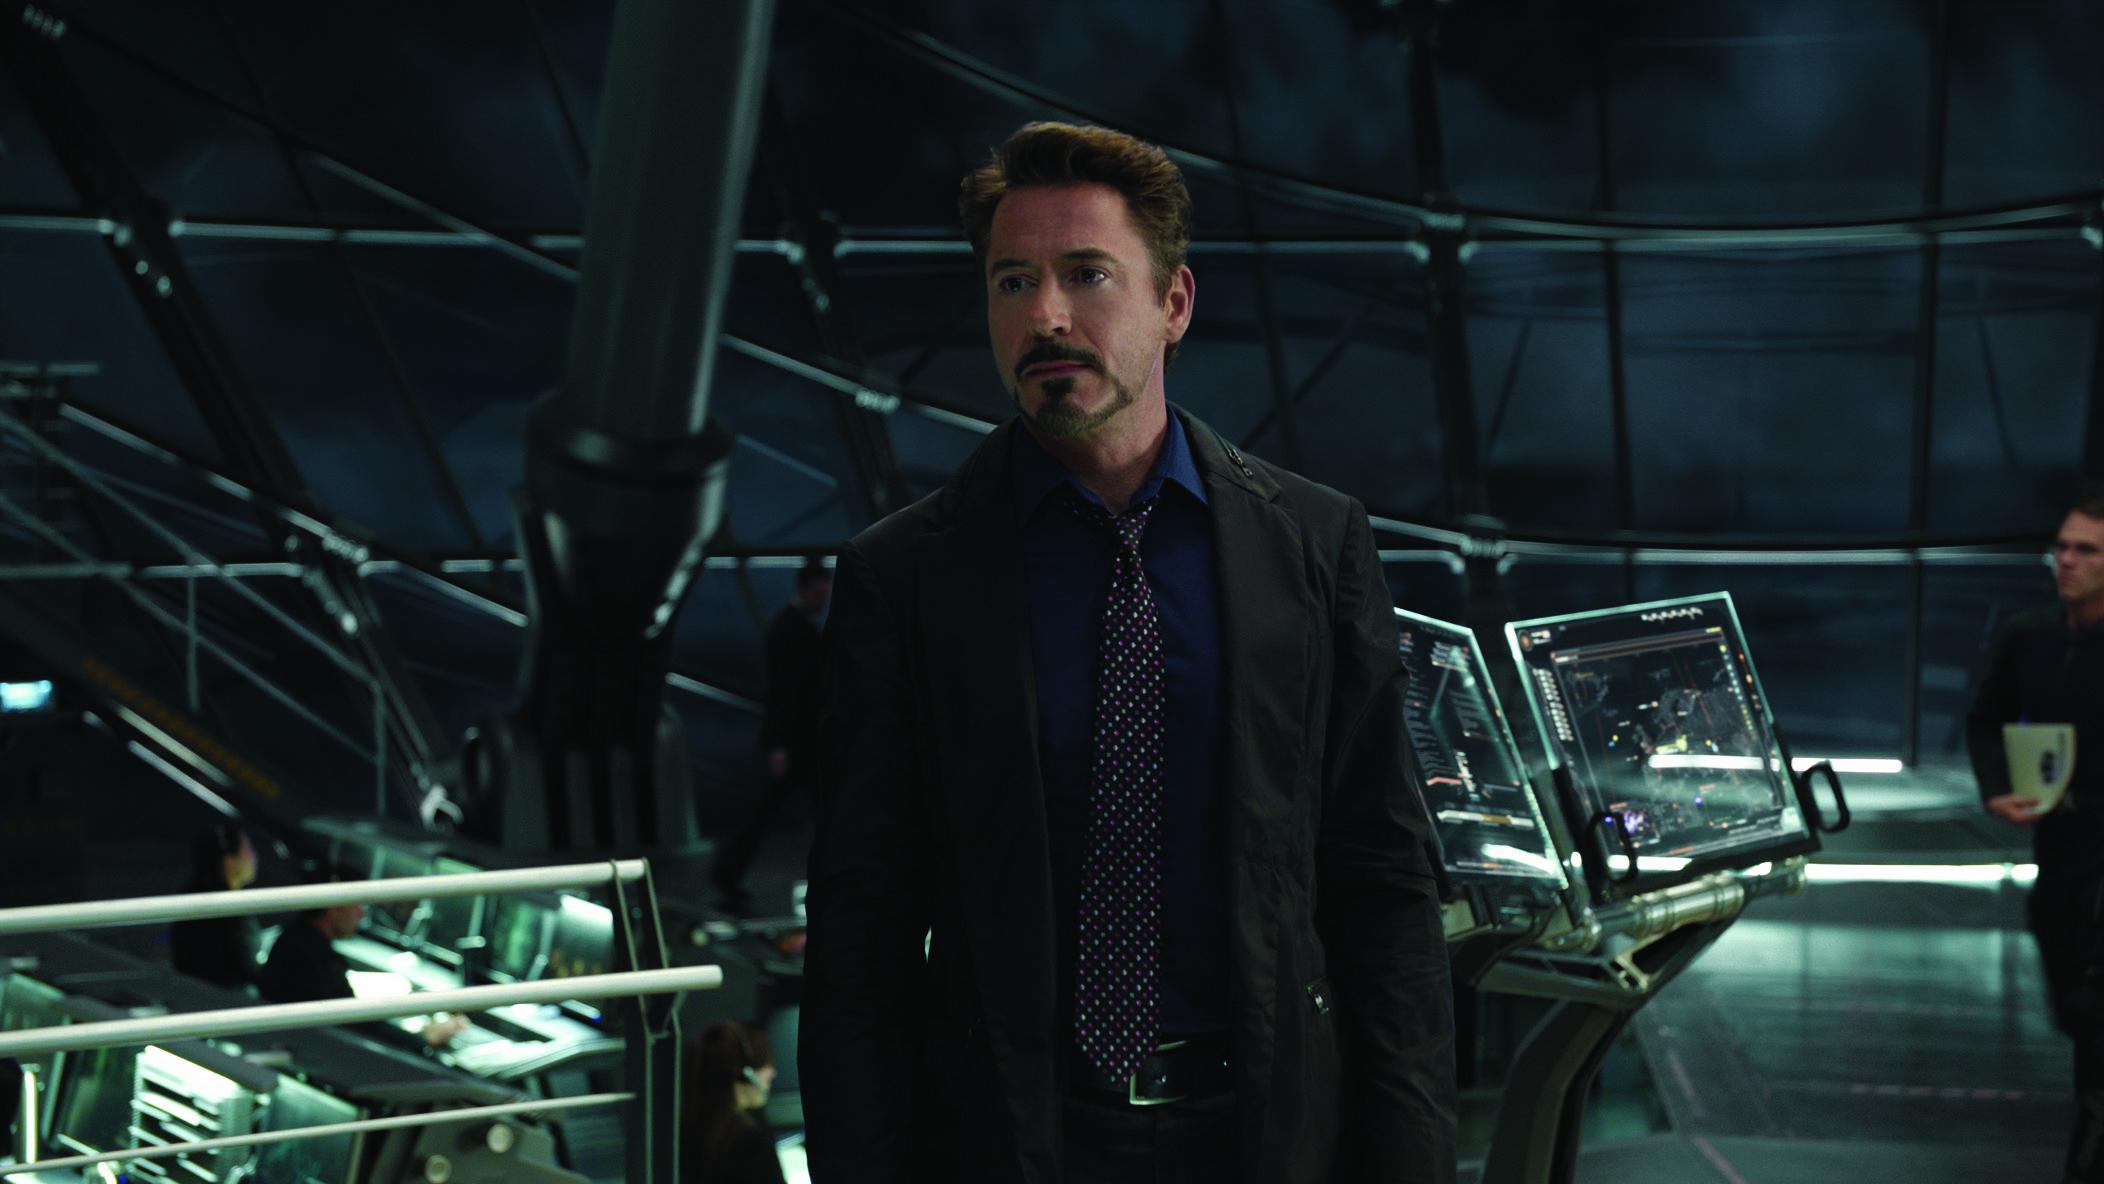 tony stark office. Tony Stark In A Suit.jpg Office